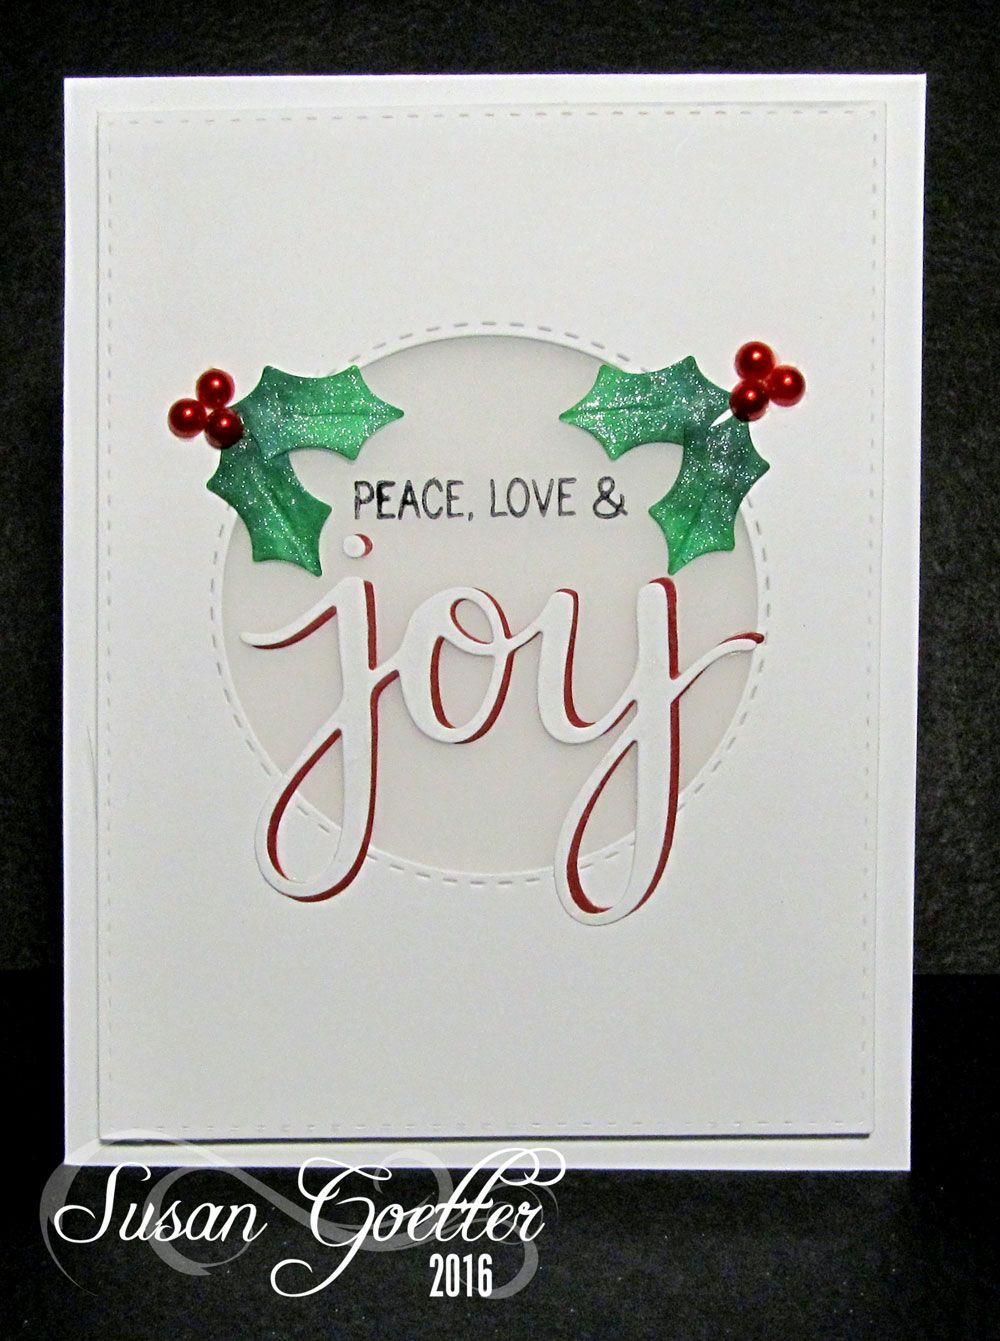 Susan Goetter Christmas Greetings Pinterest Cards Christmas